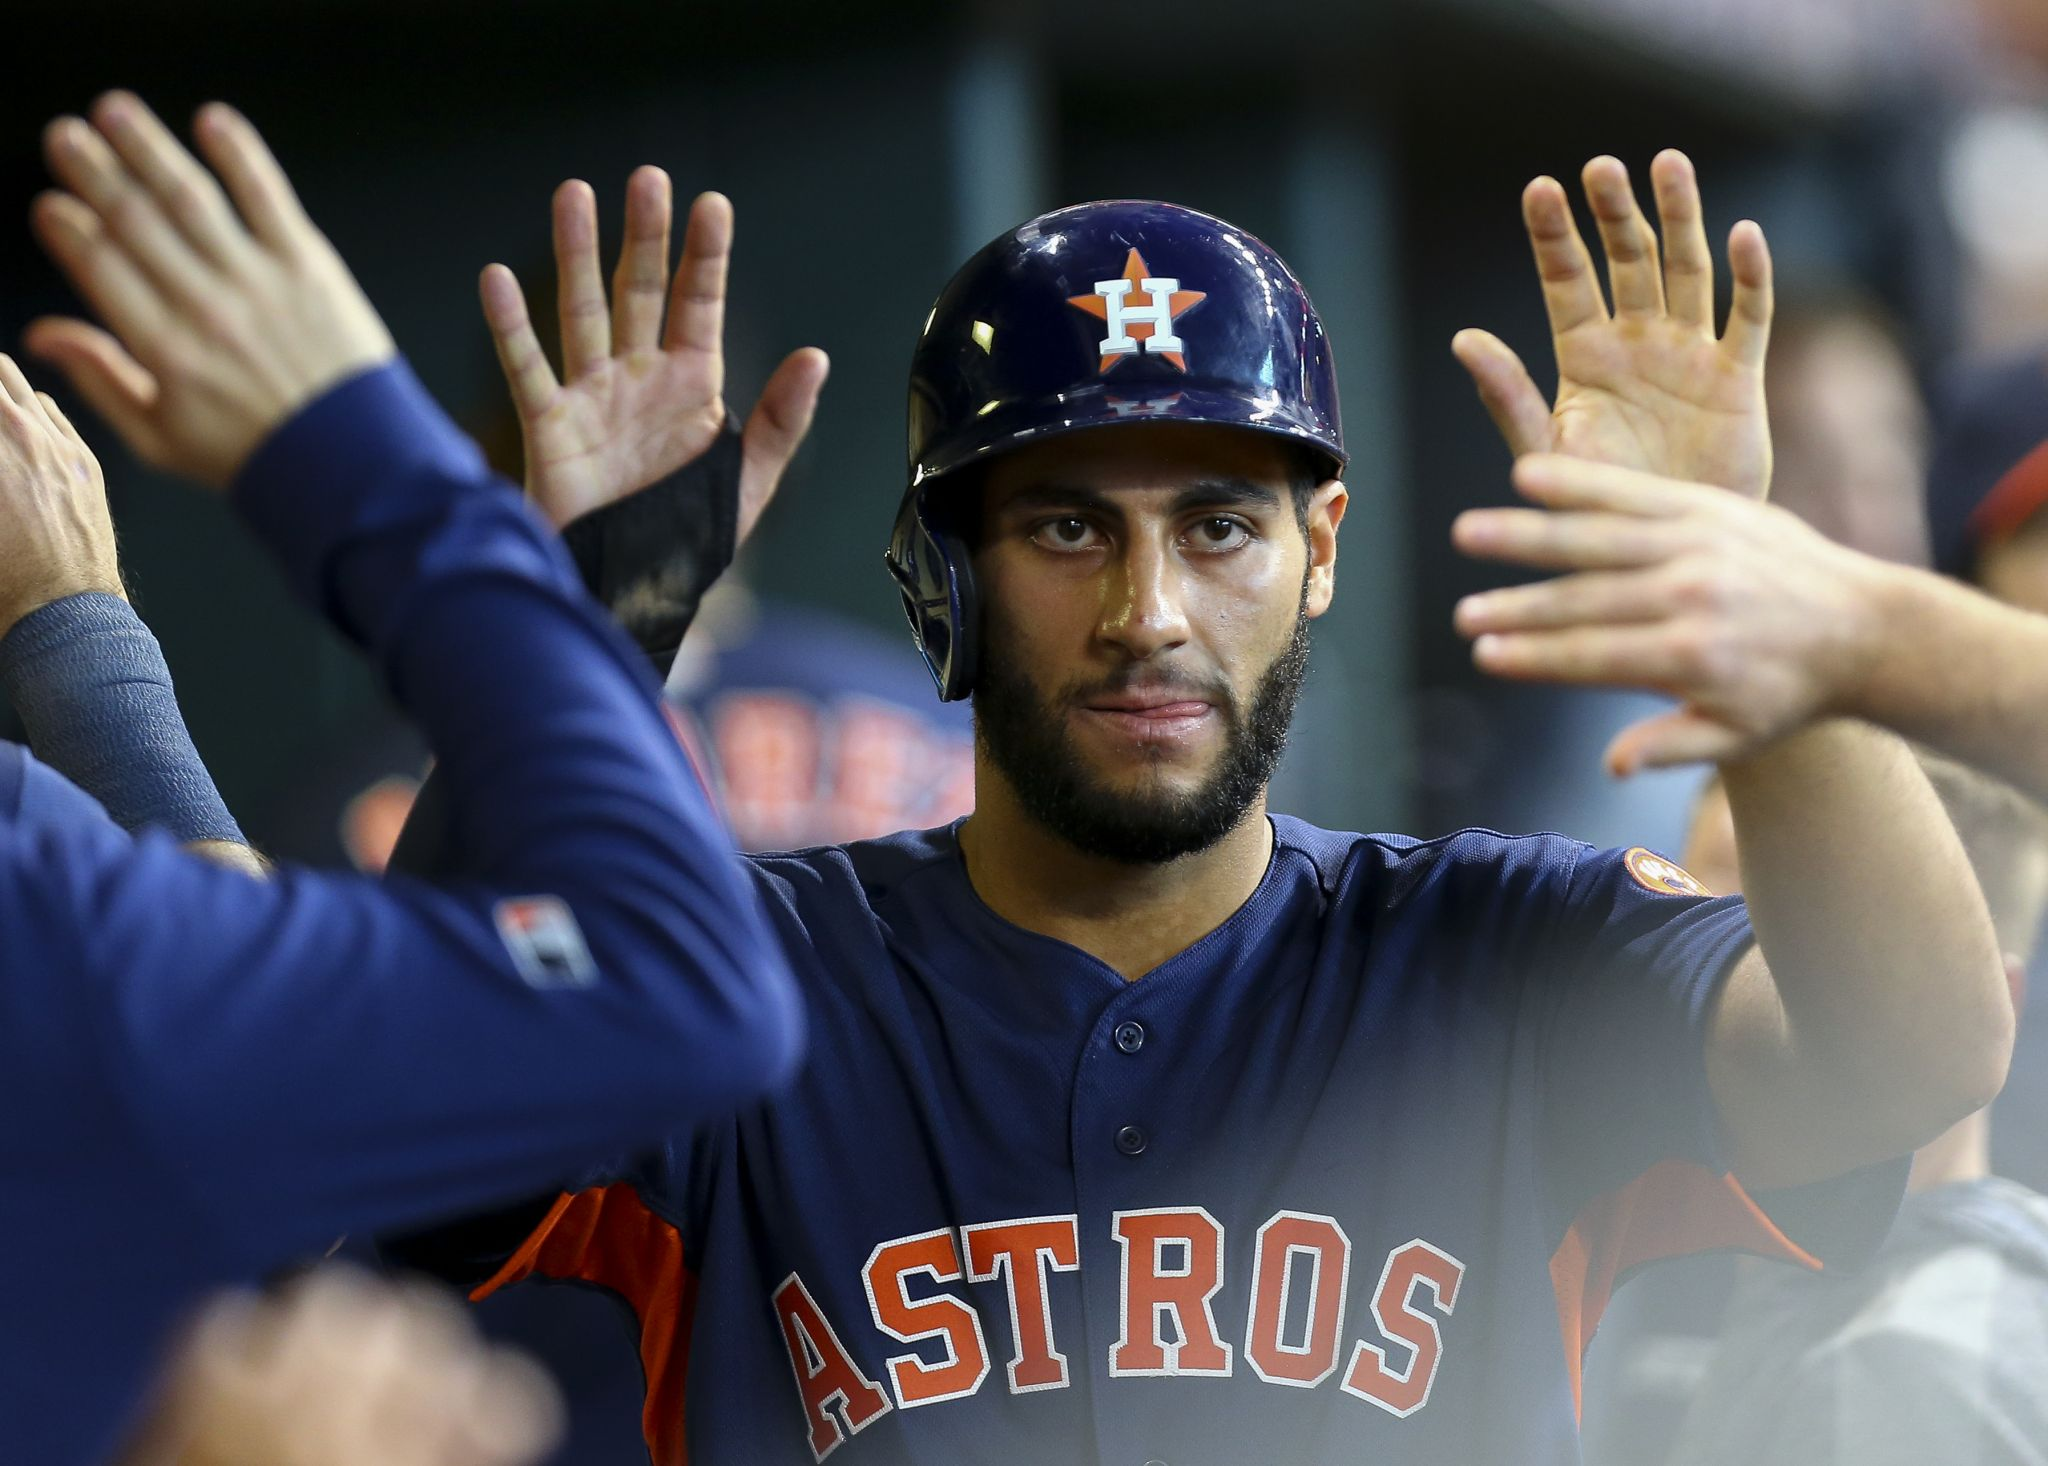 Astros honor prospects Abraham Toro, Cristian Javier